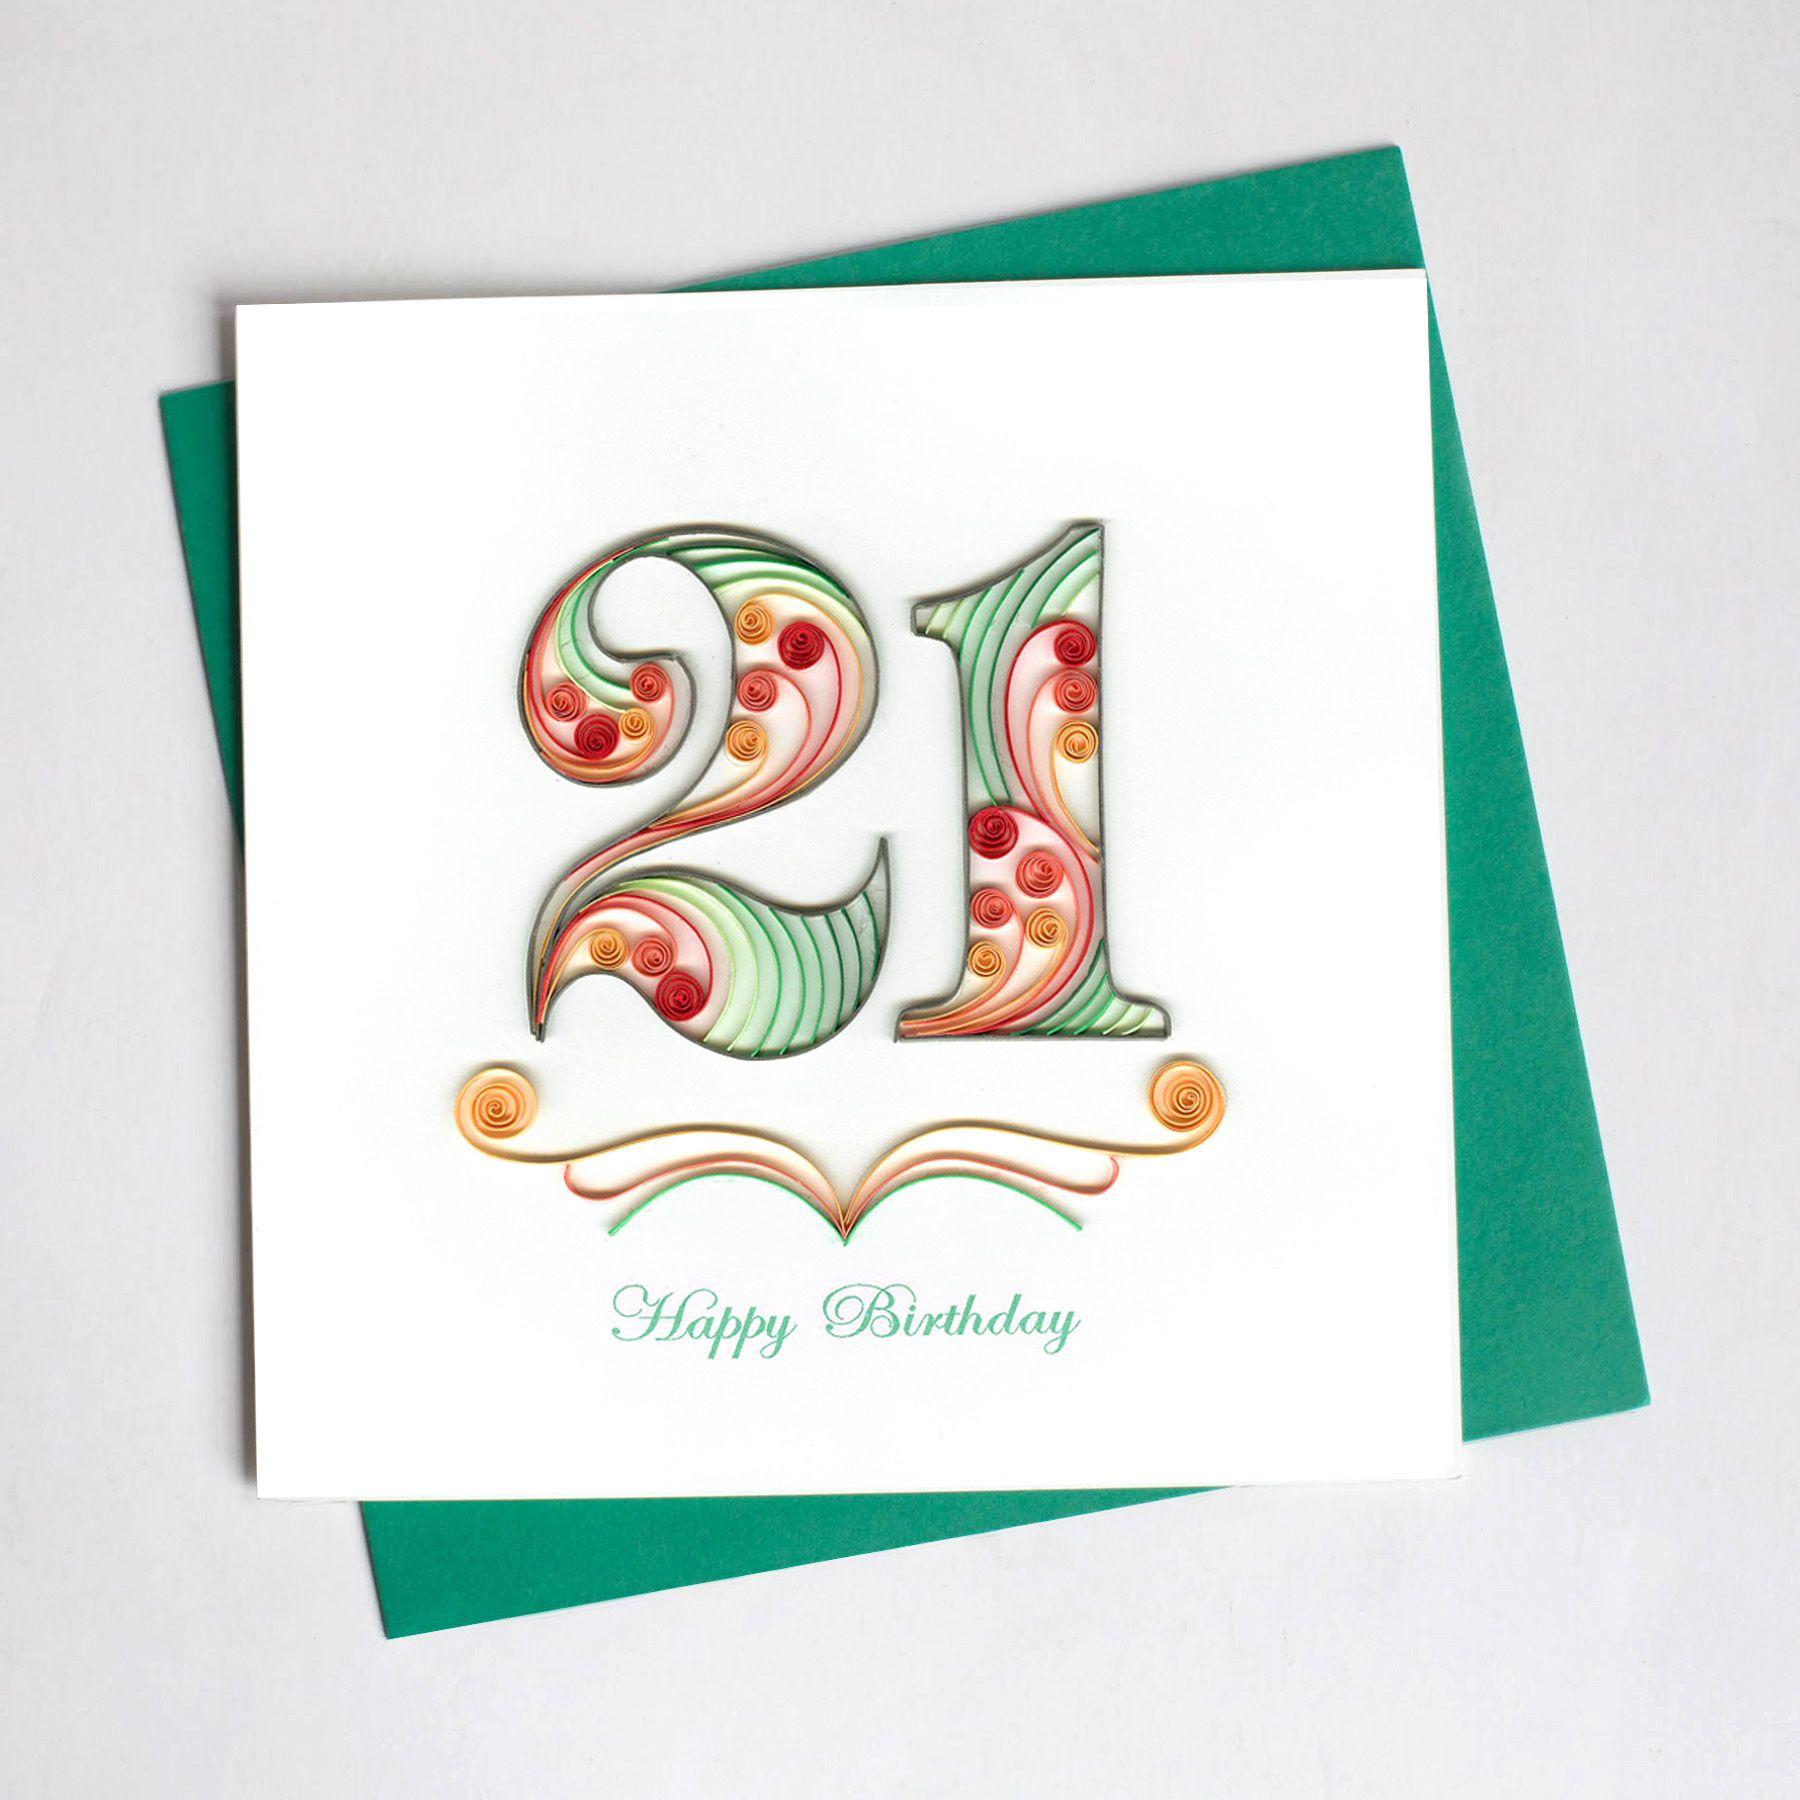 21st Birthday Bd101 Quilling Card 21st Birthday Cards Quilling Birthday Cards Quilling Cards